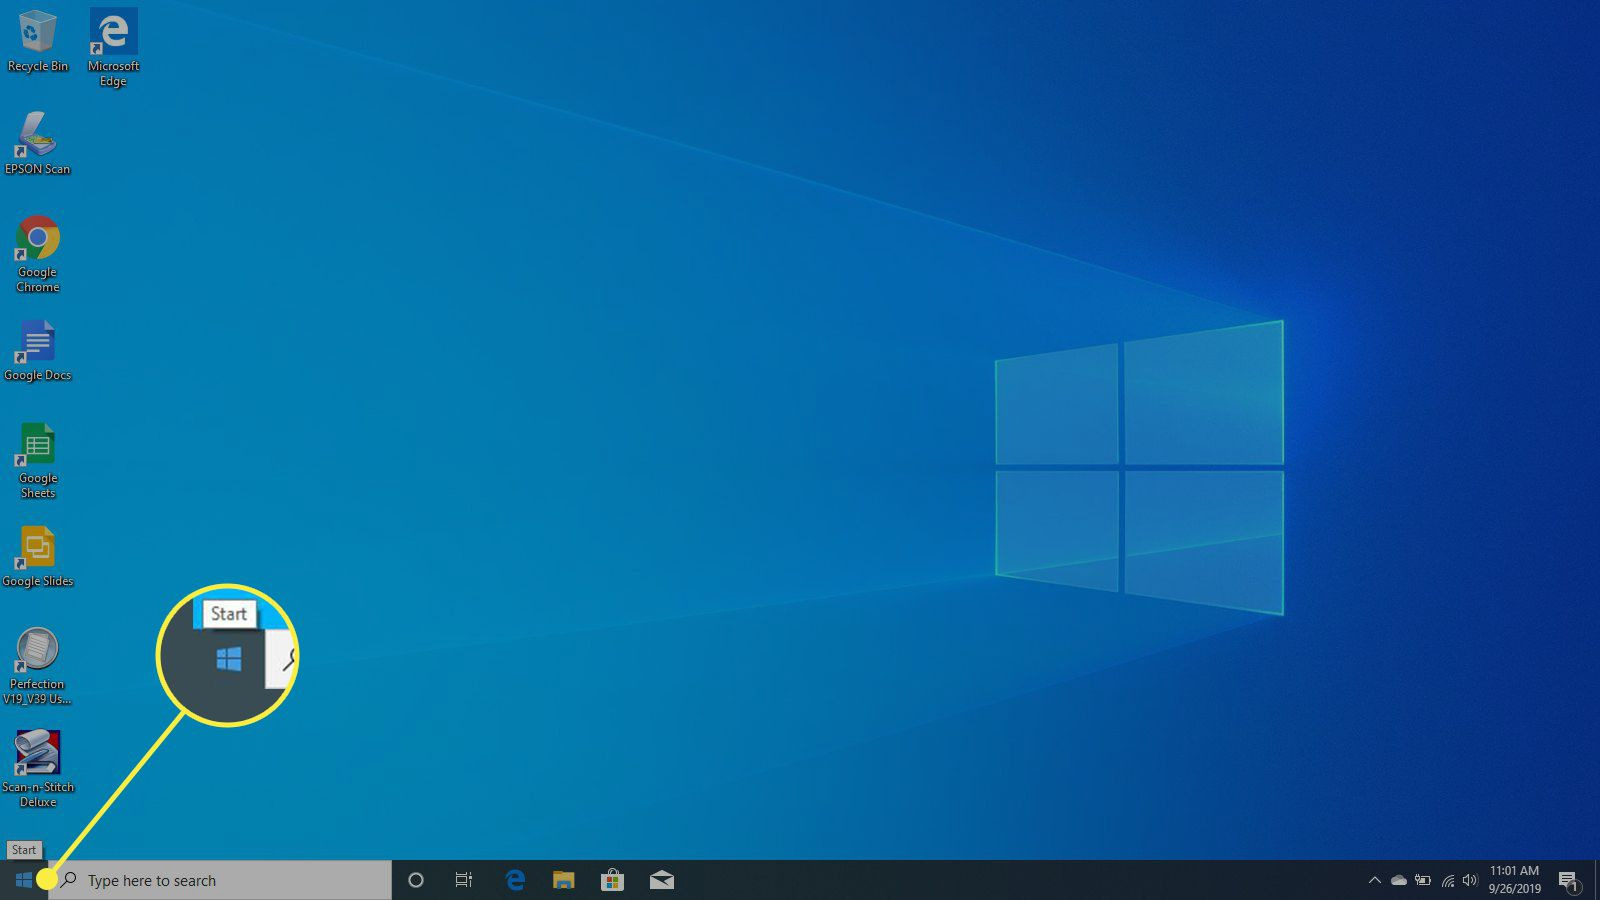 The Start button in Windows 10